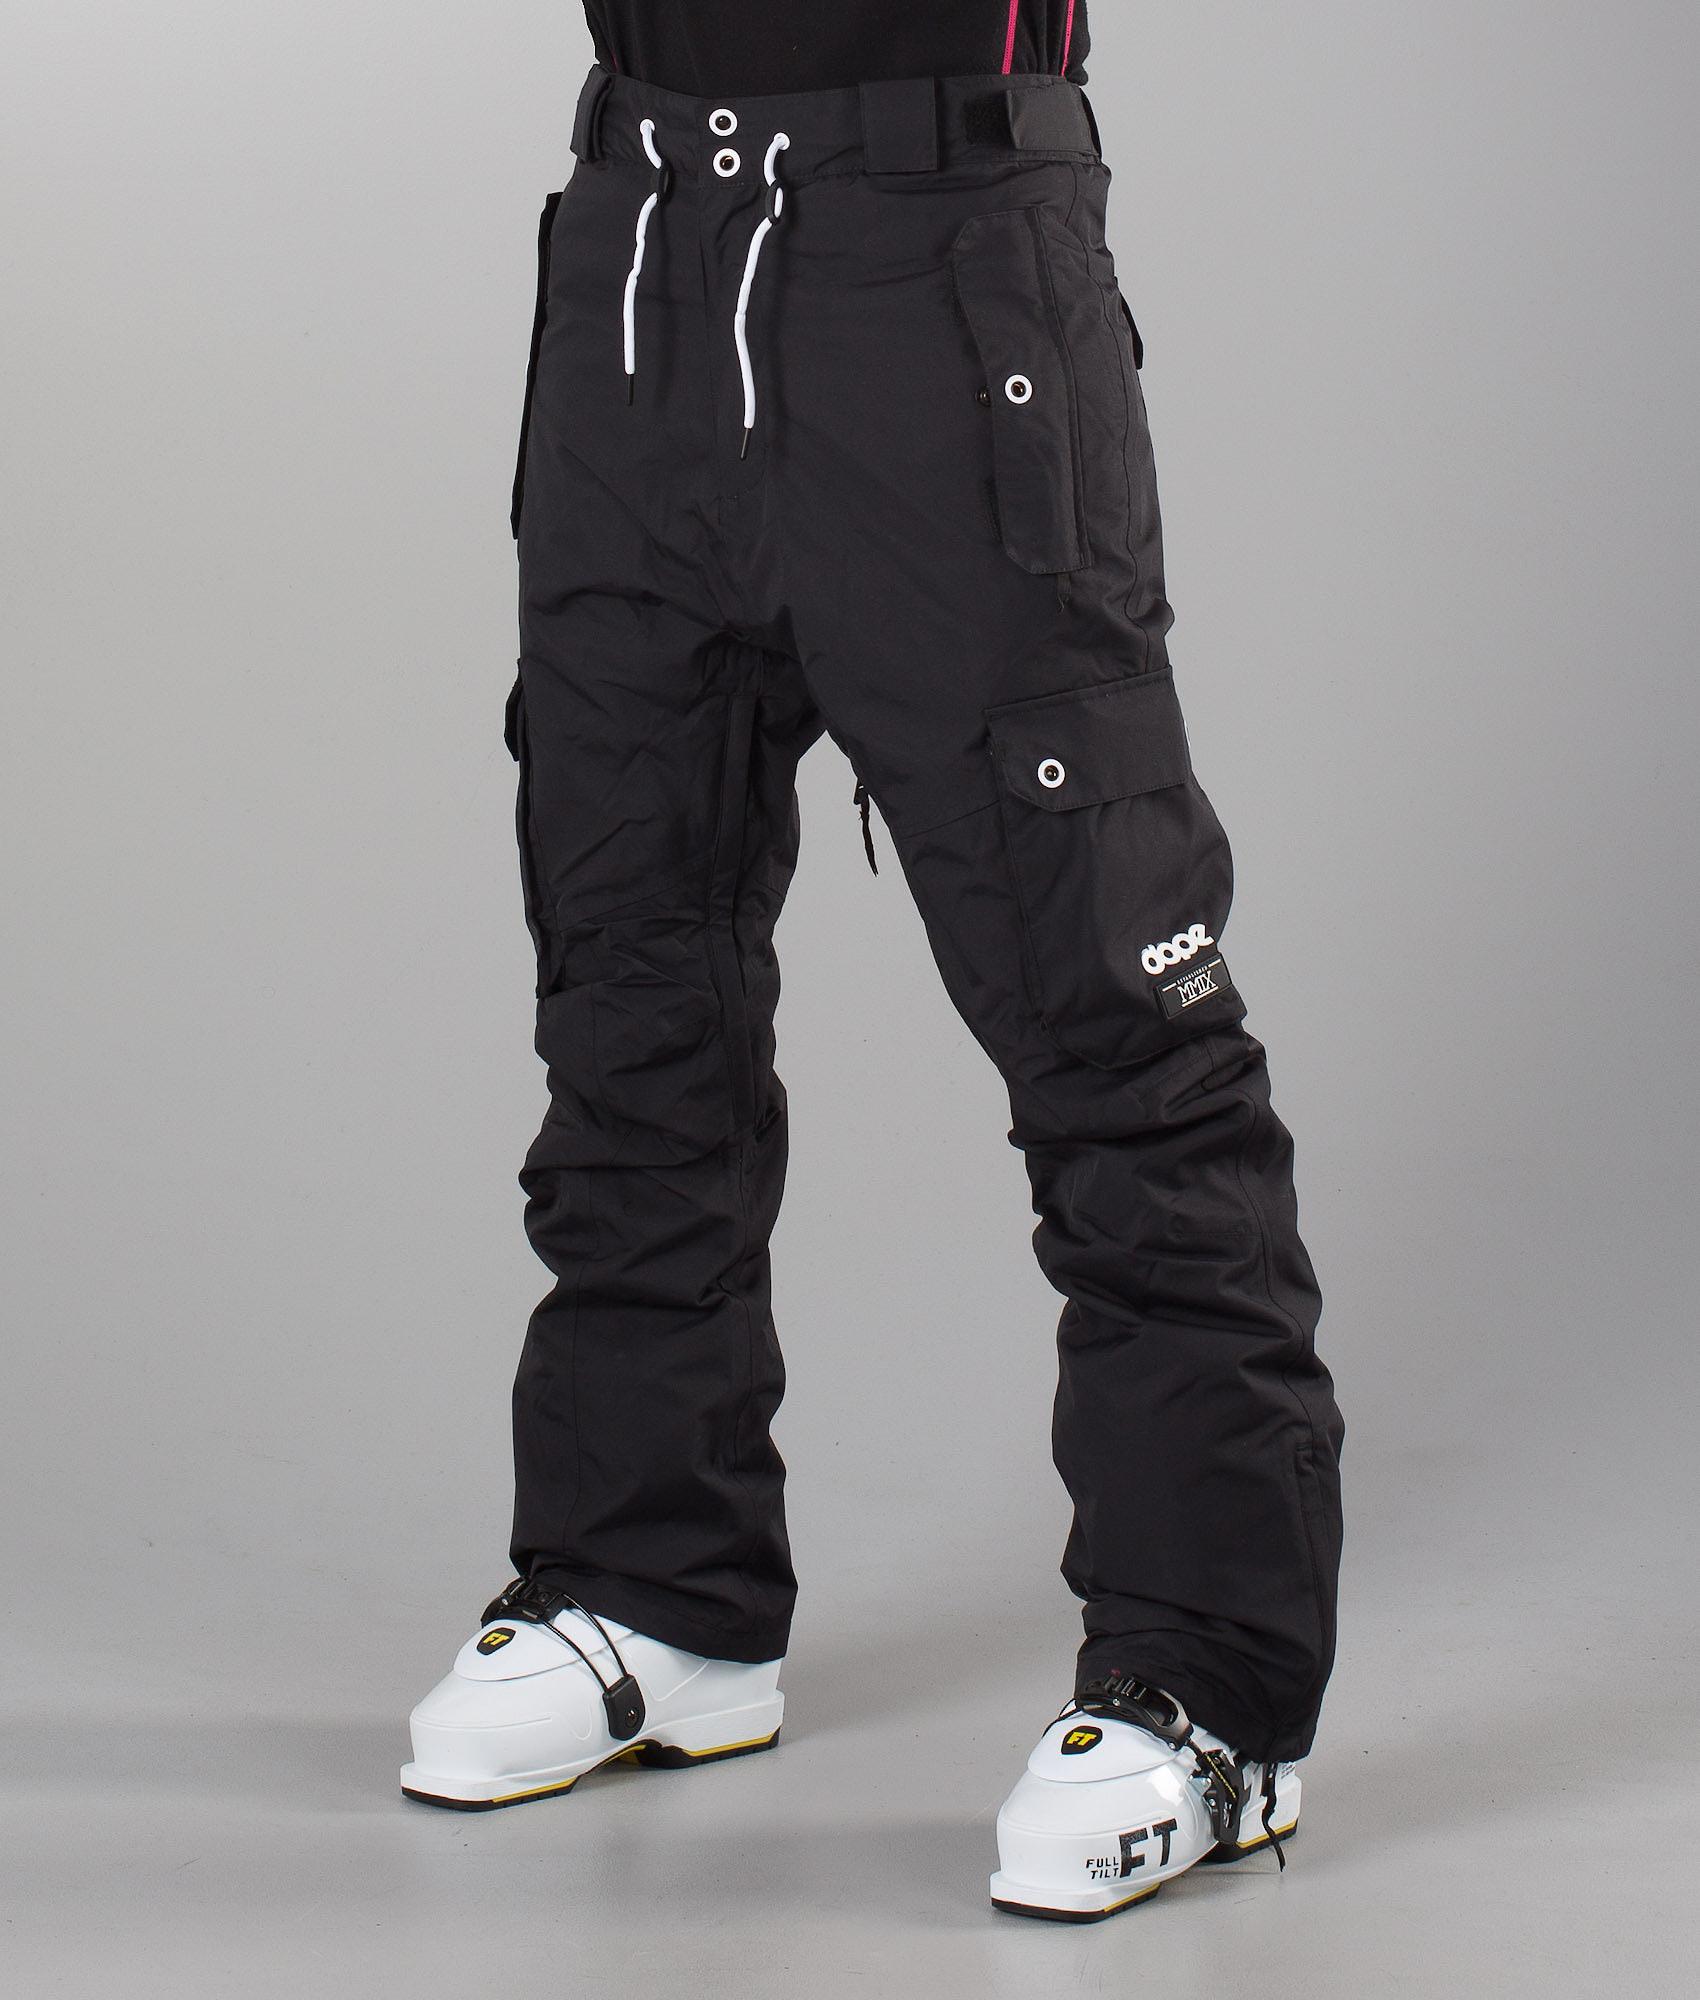 6f54b4f657 Dope Adept Unisex Ski Pants Black - Ridestore.com